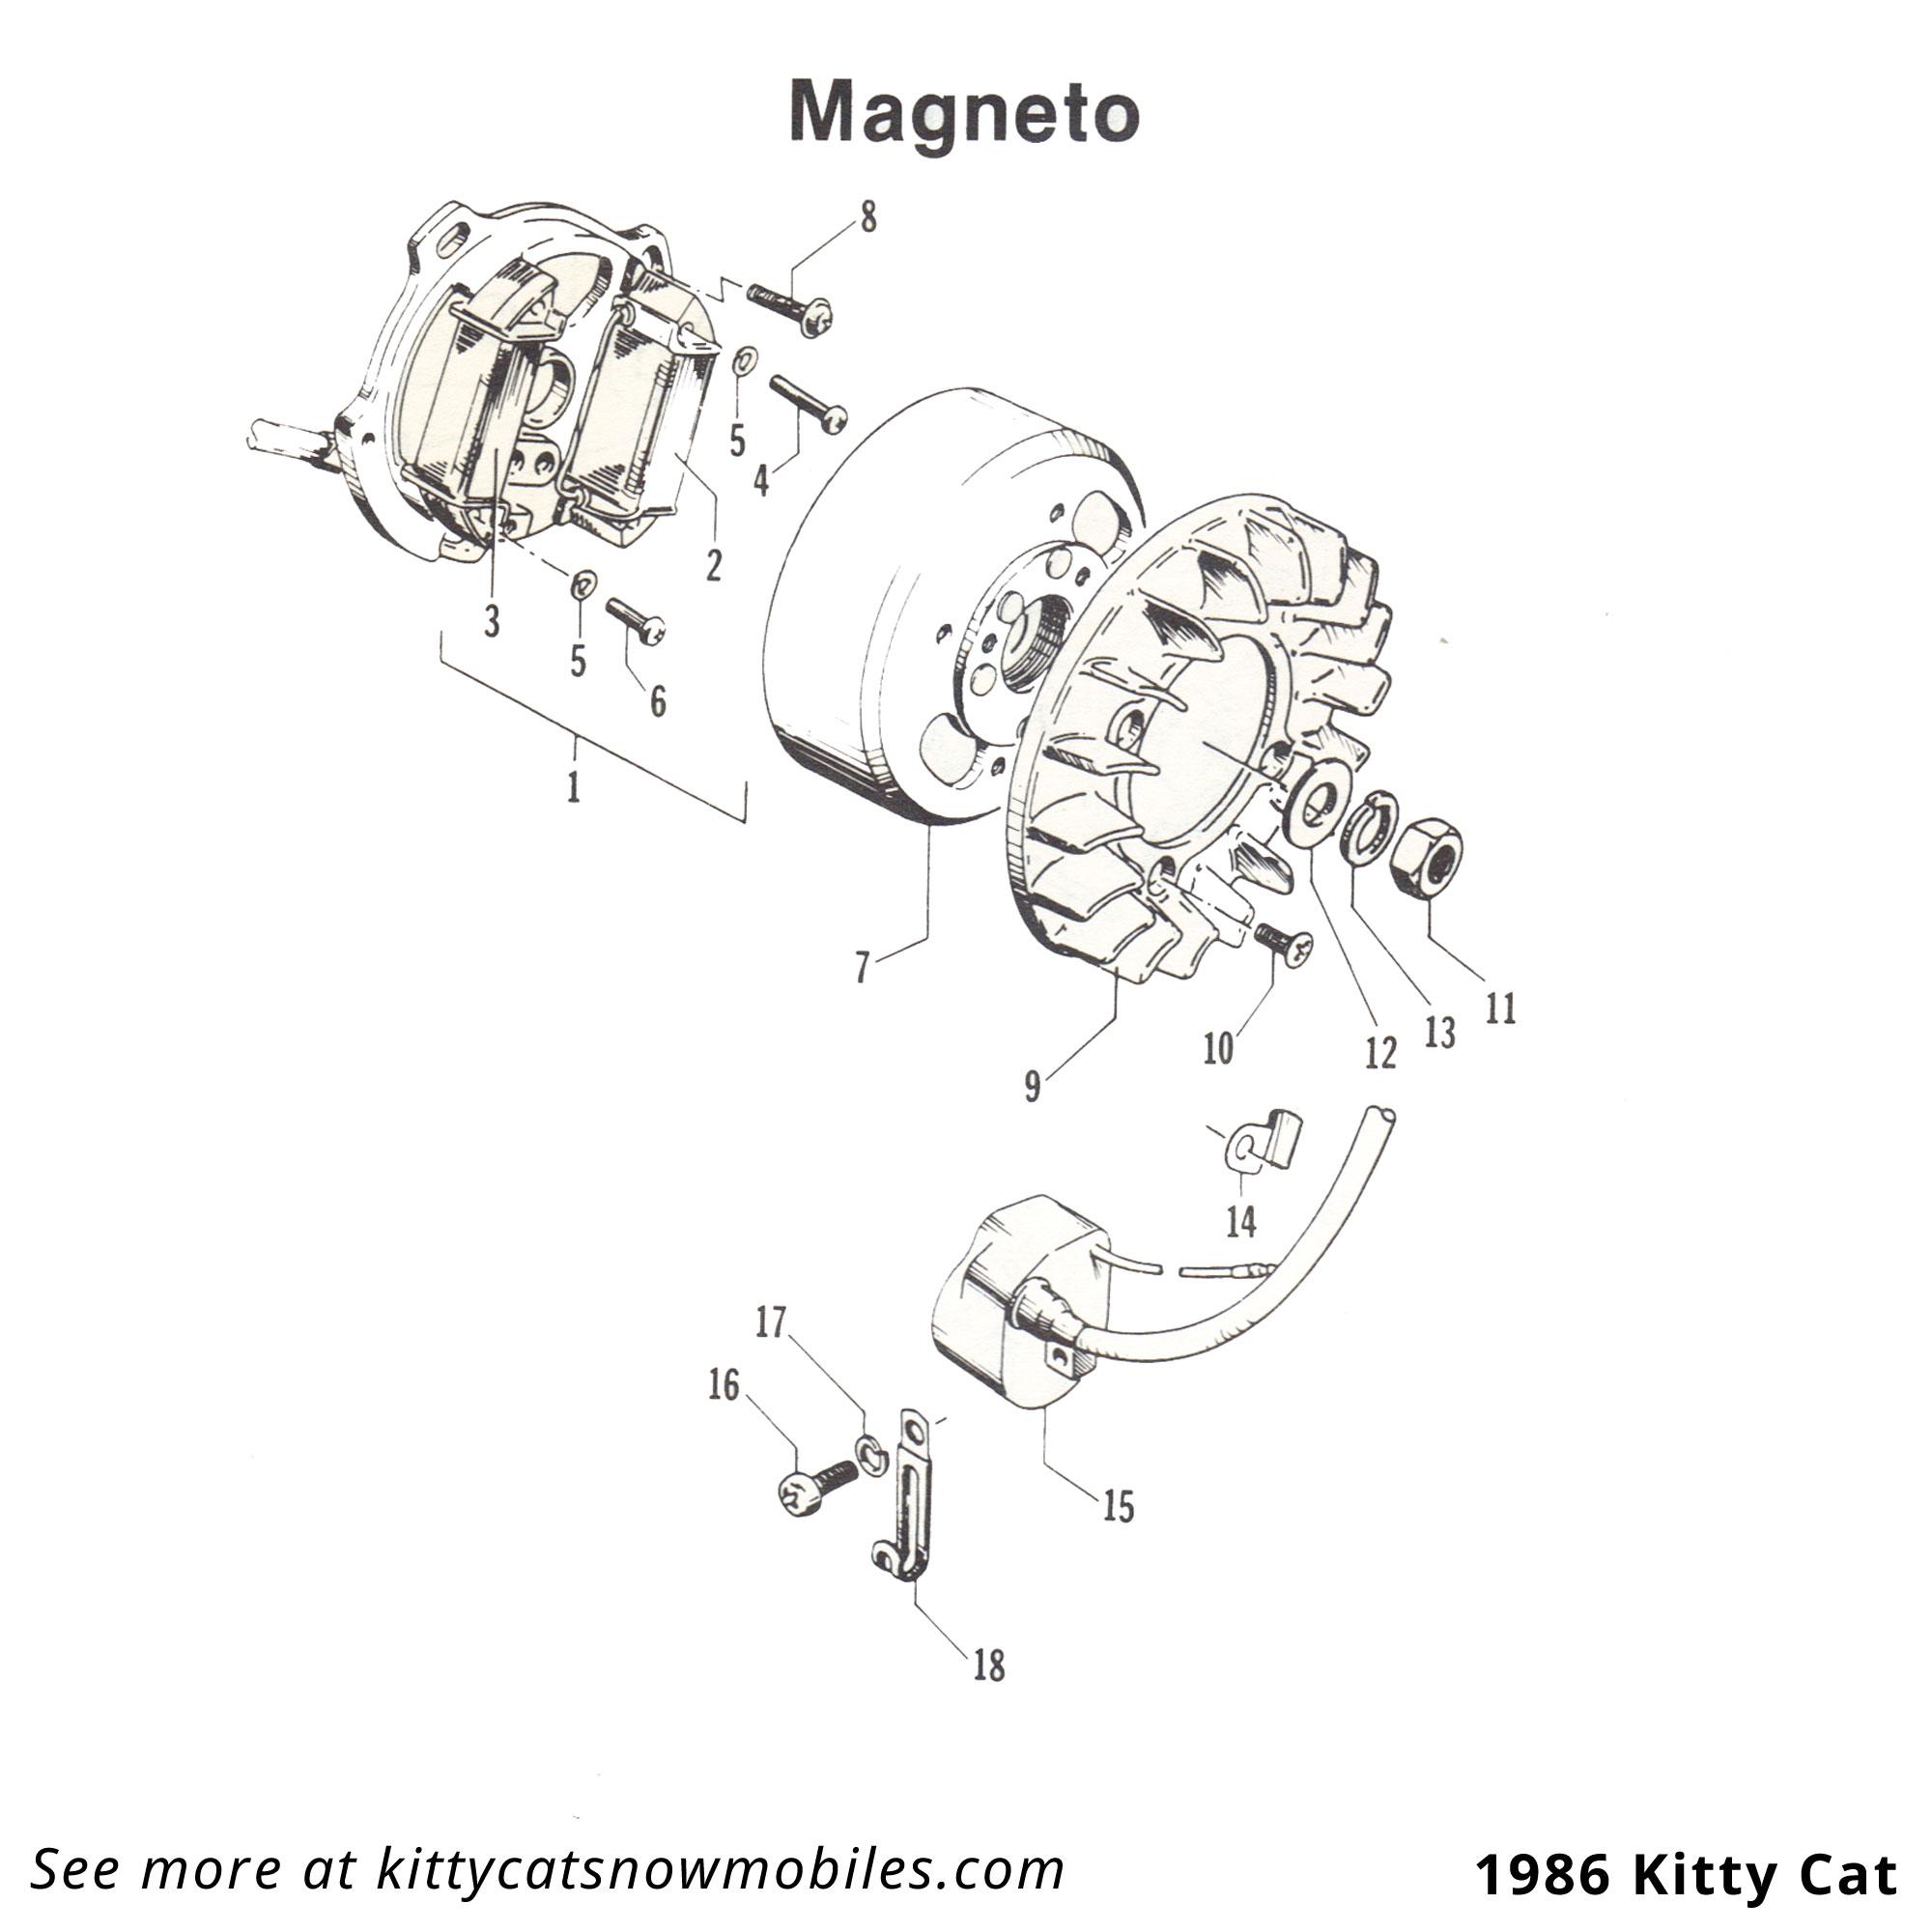 86 Magneto parts